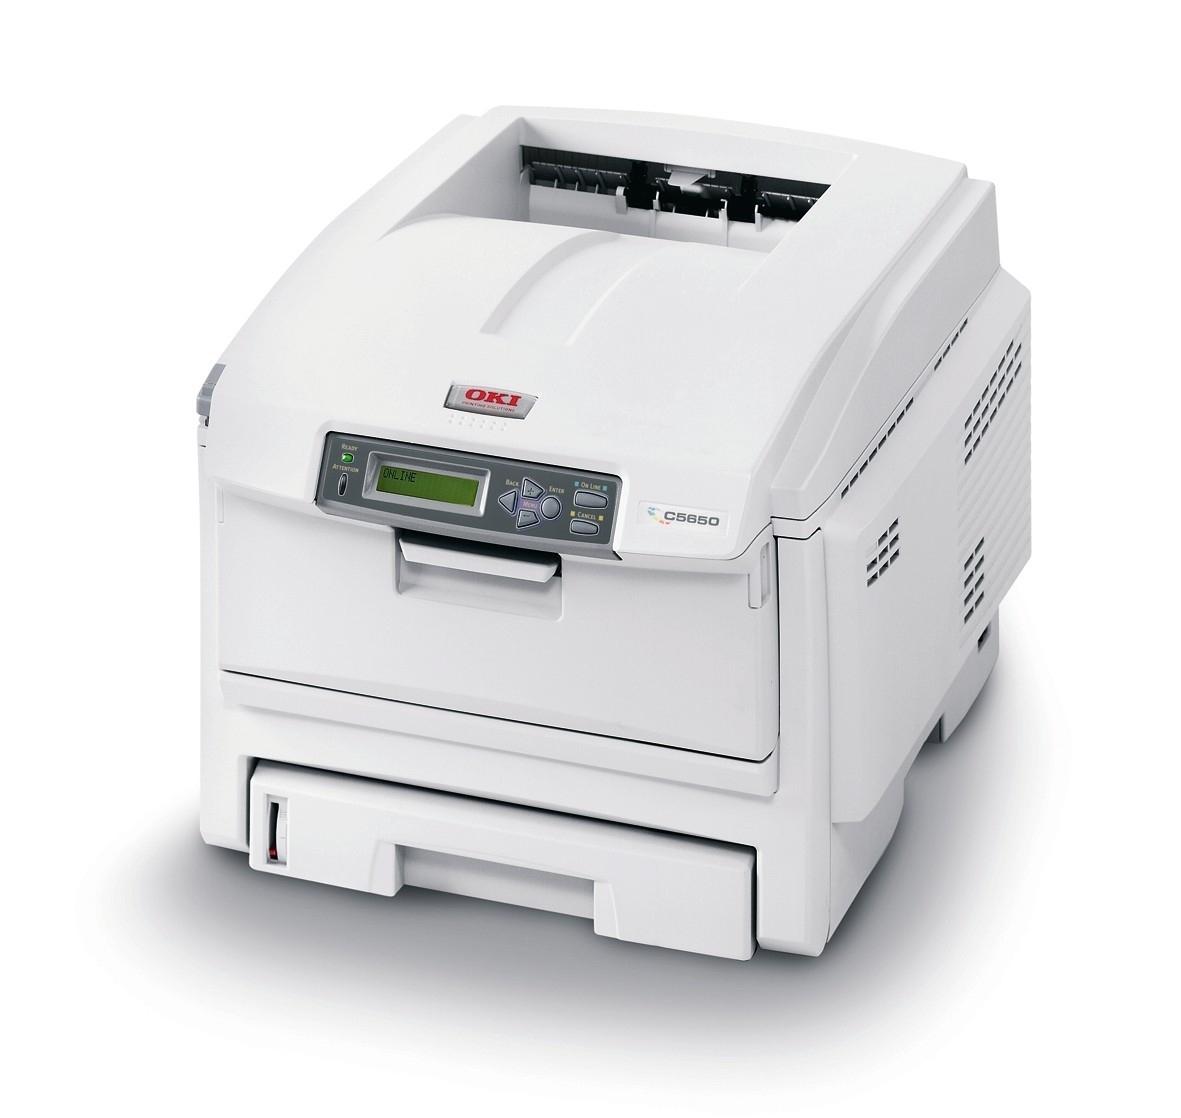 Oki OkiPage C5950dtn Printer 01213301 - Refurbished